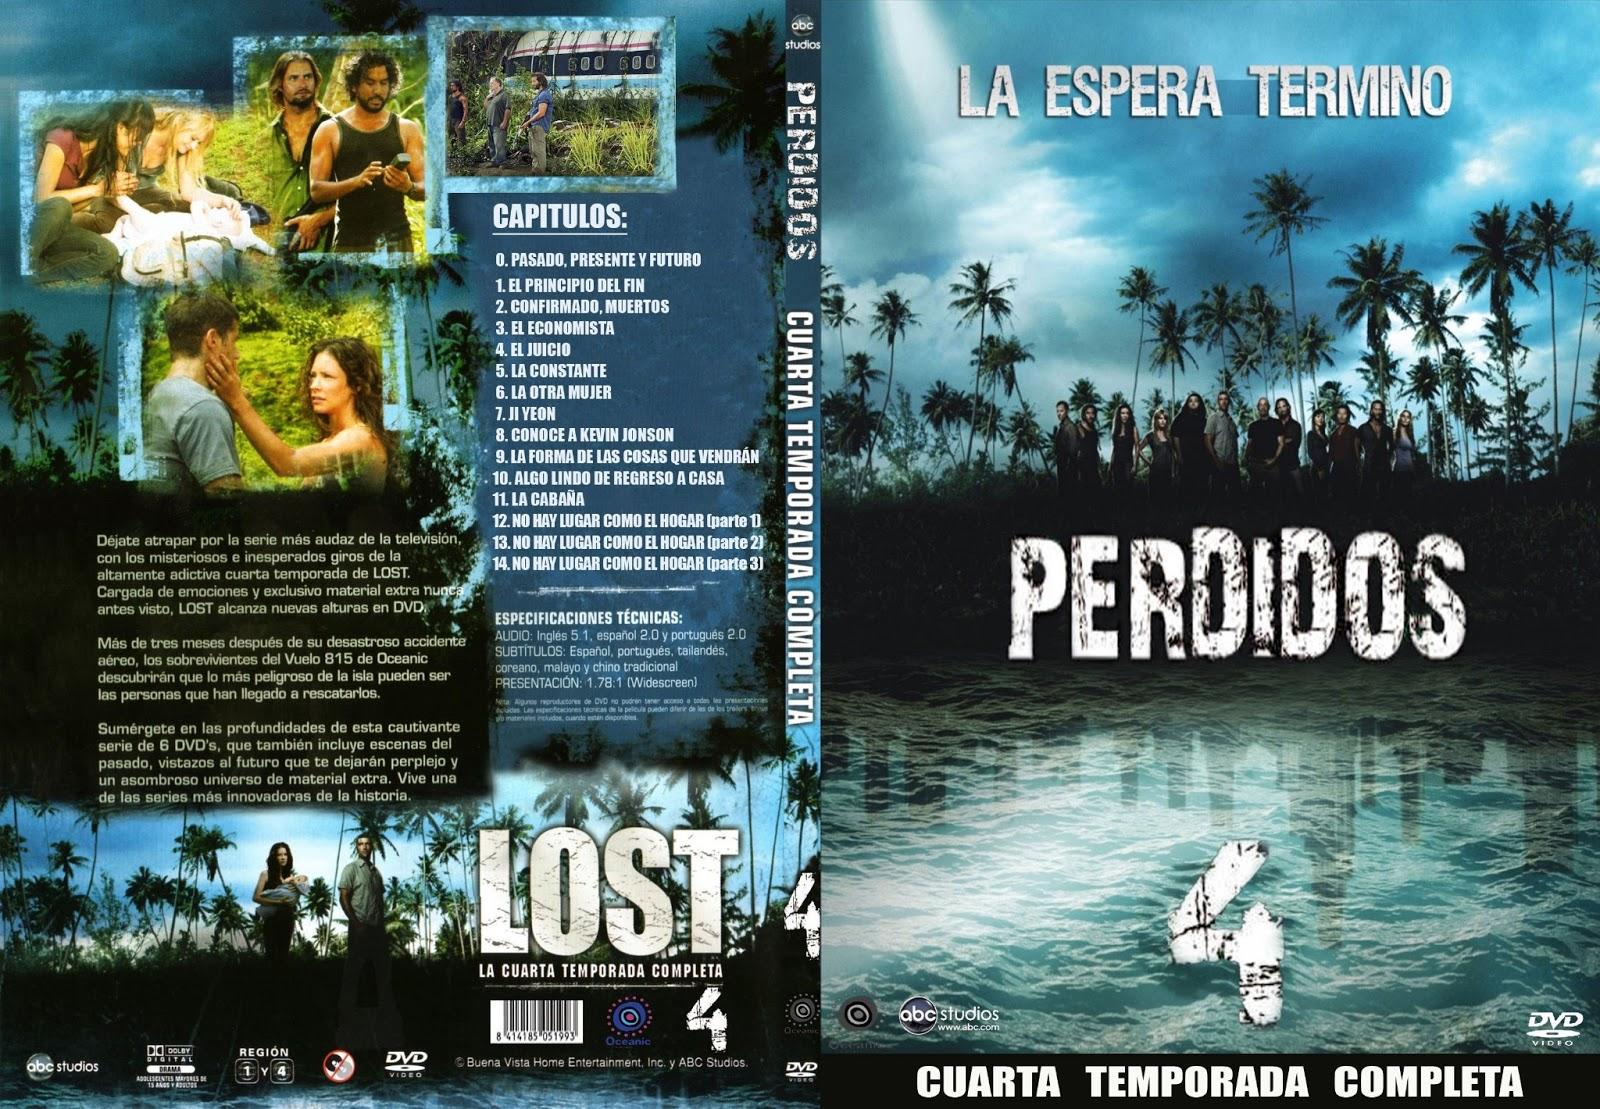 PELICULAS DVD FULL: LOST - PERDIDOS- CUARTA TEMPORADA COMPLETA